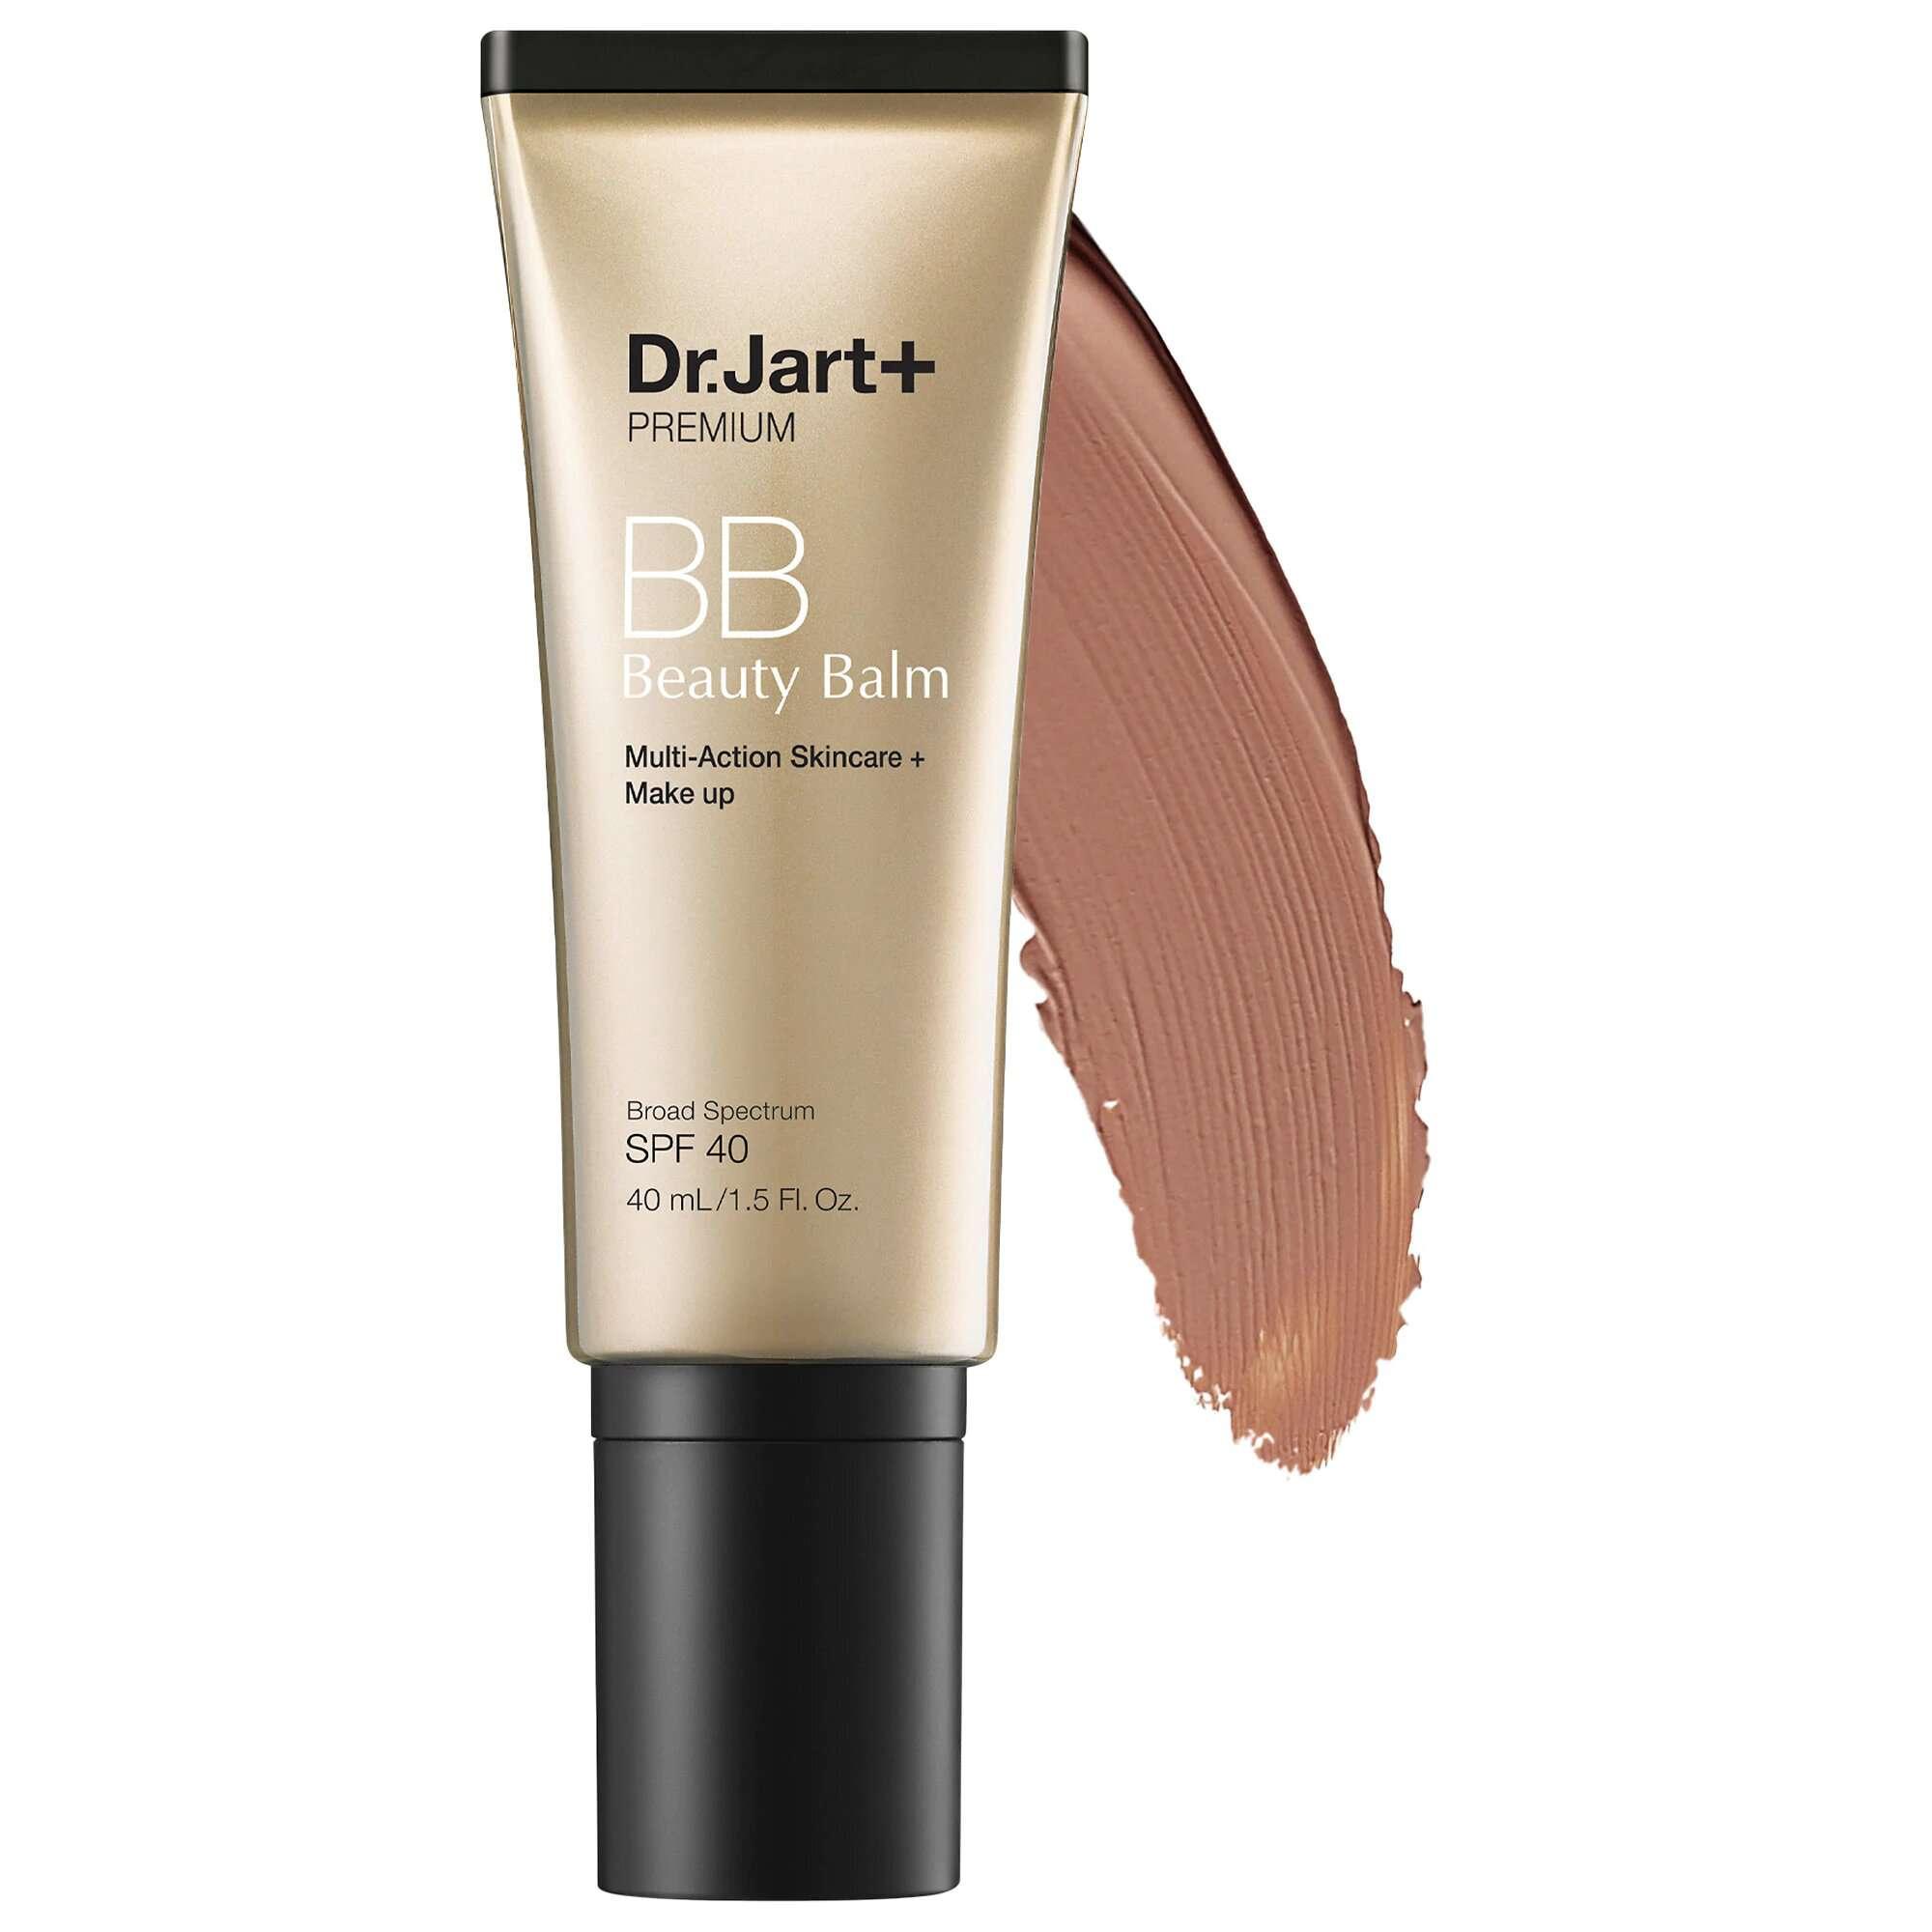 Dr. Jart+ Premium Beauty Balm SPF 40